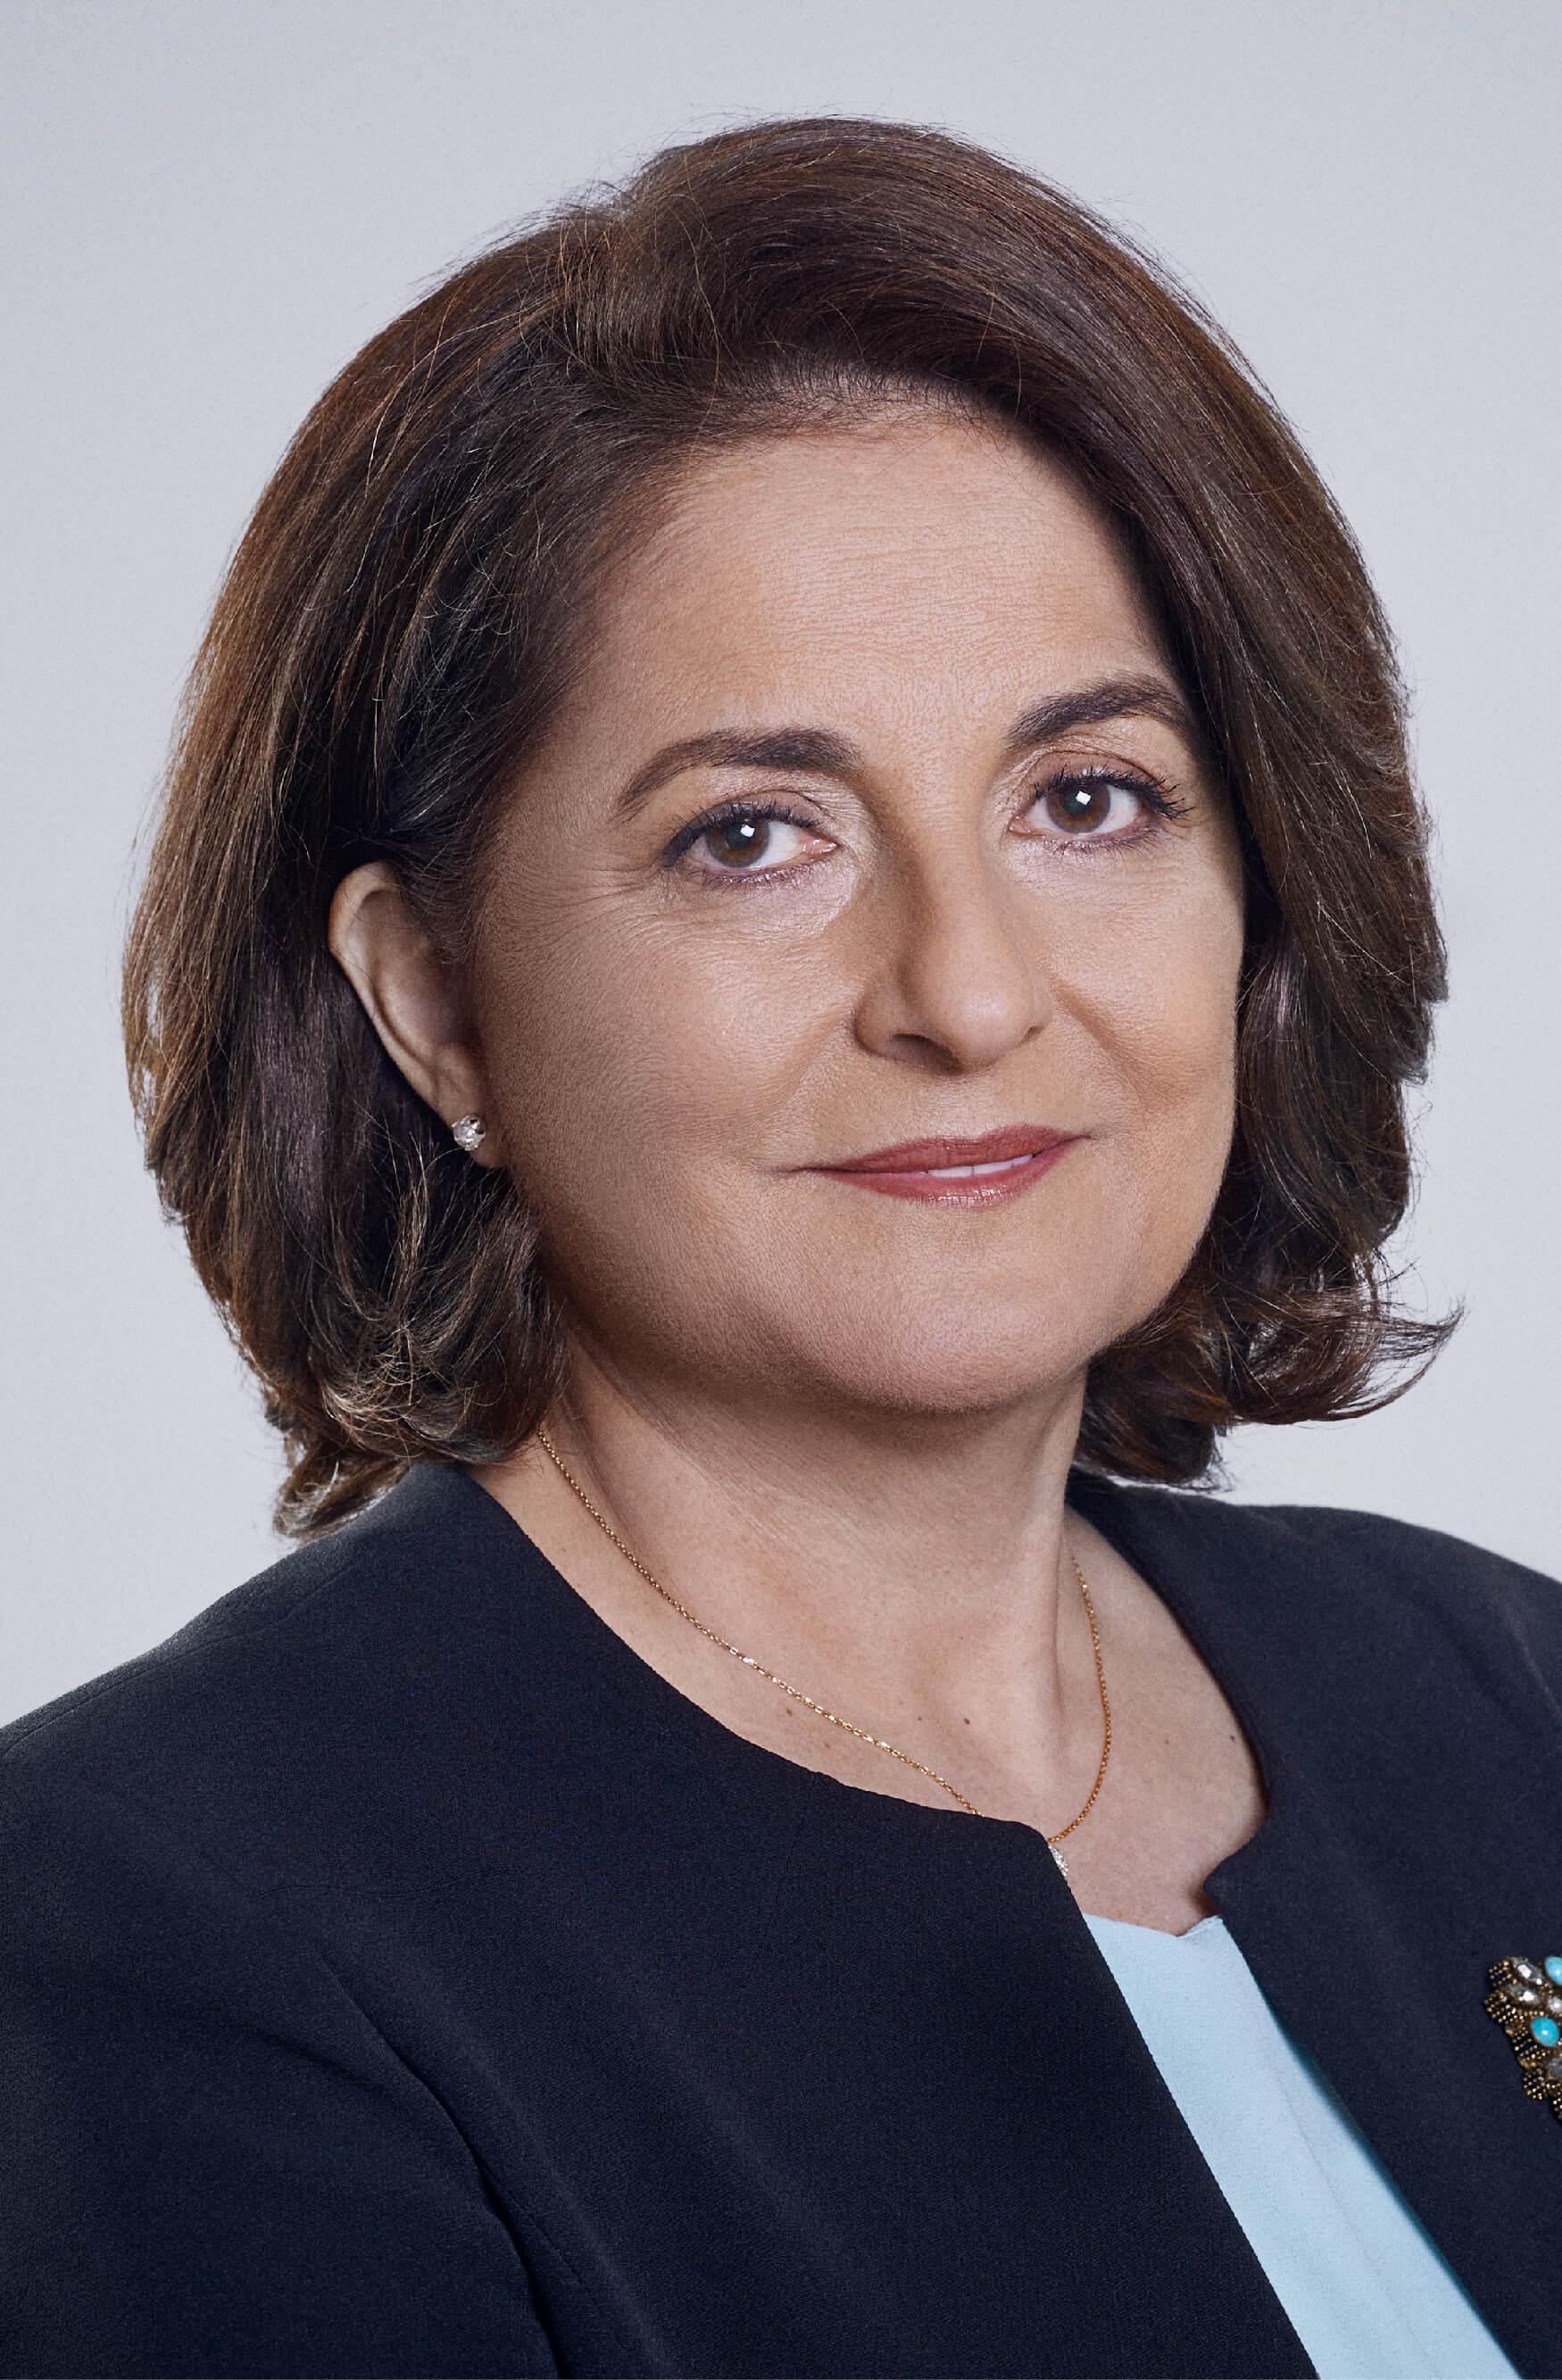 2020 FWIS Laureates Winner Abla Mehio Sibai 教授